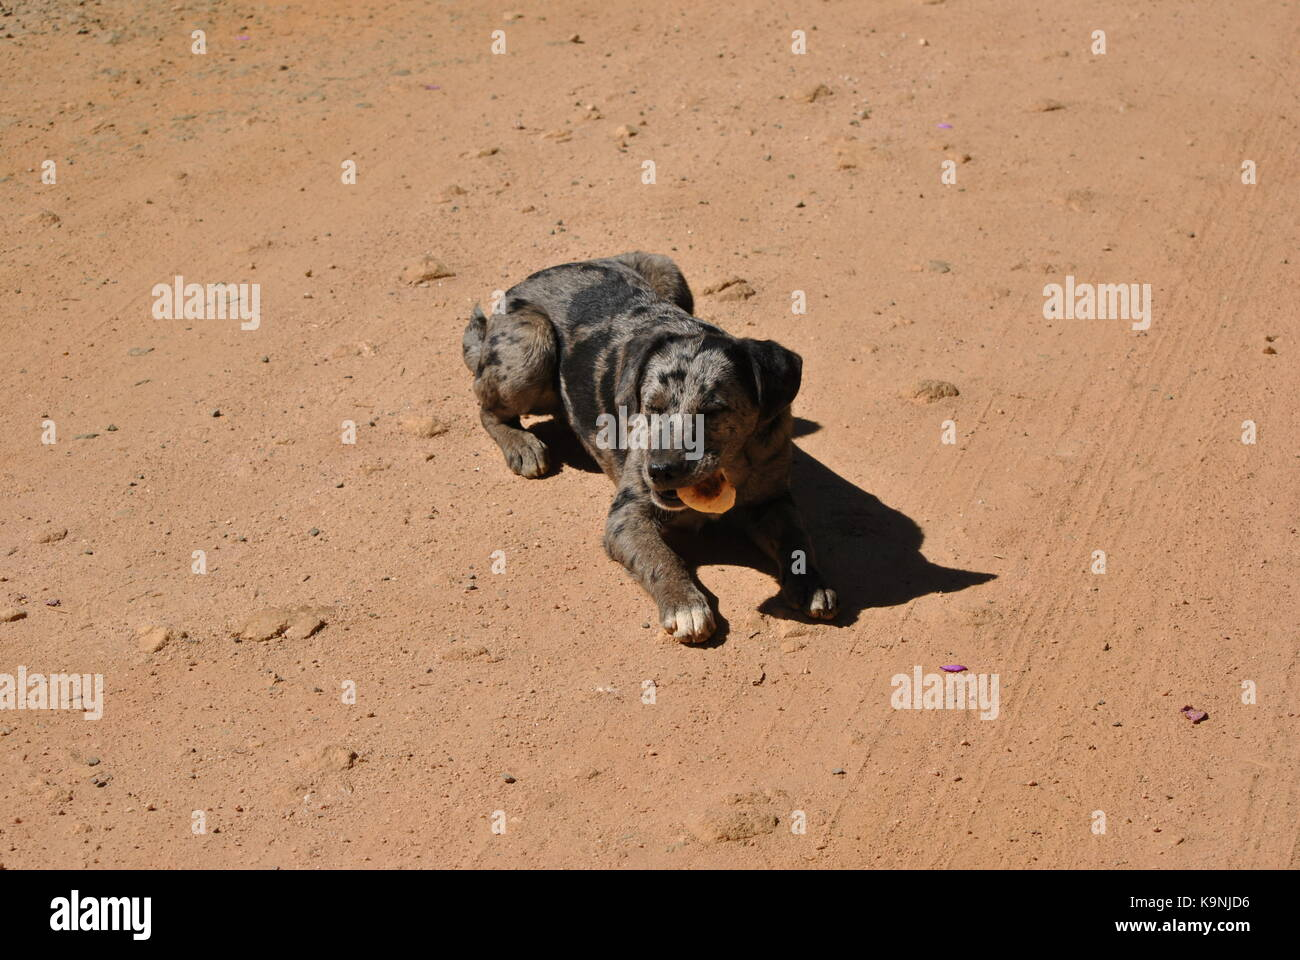 Street dog eating - Stock Image